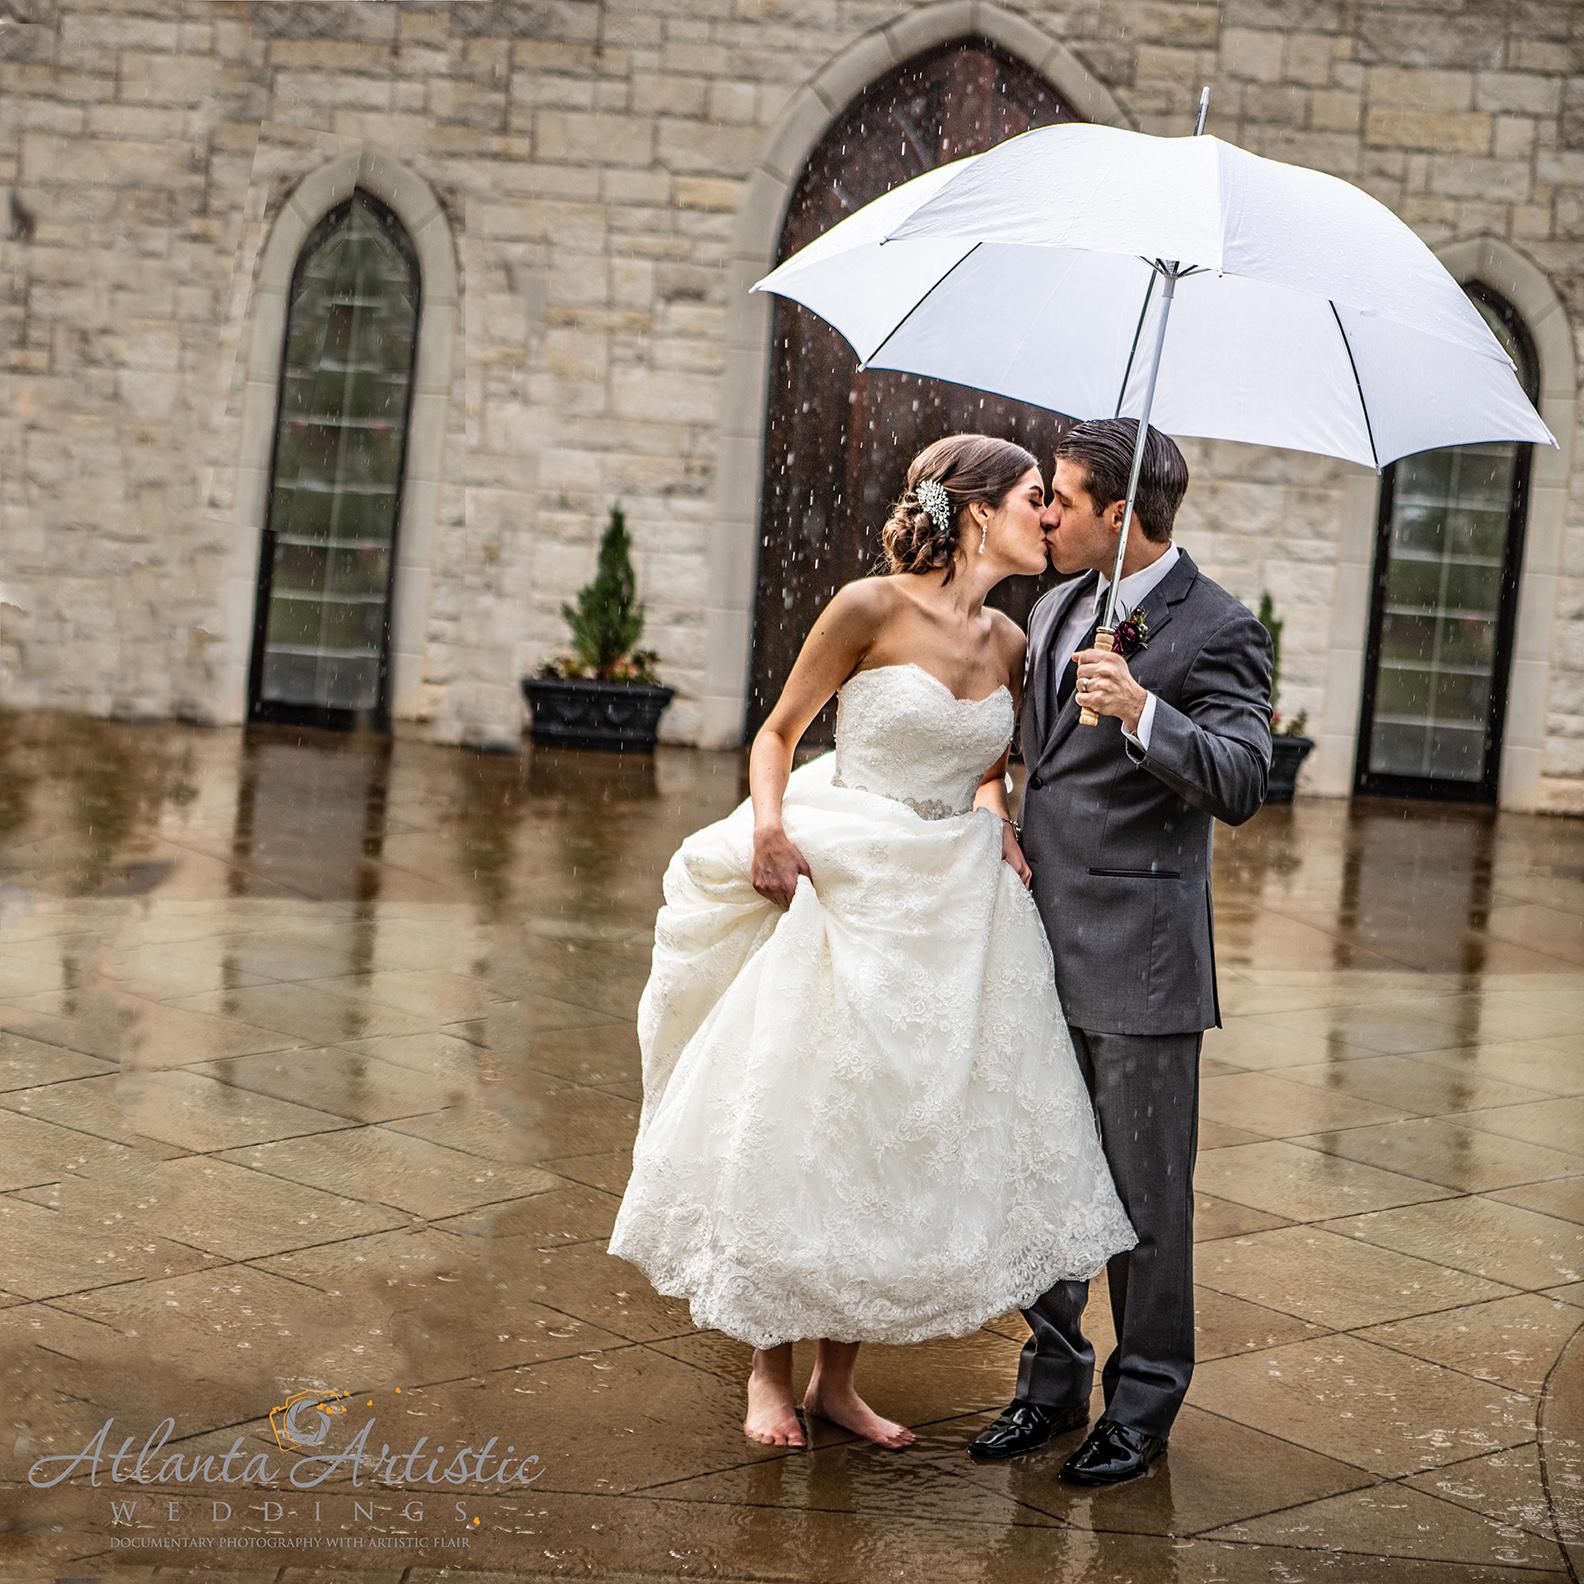 Atlanta Wedding Photography: Atlanta Wedding Photographer David Diener